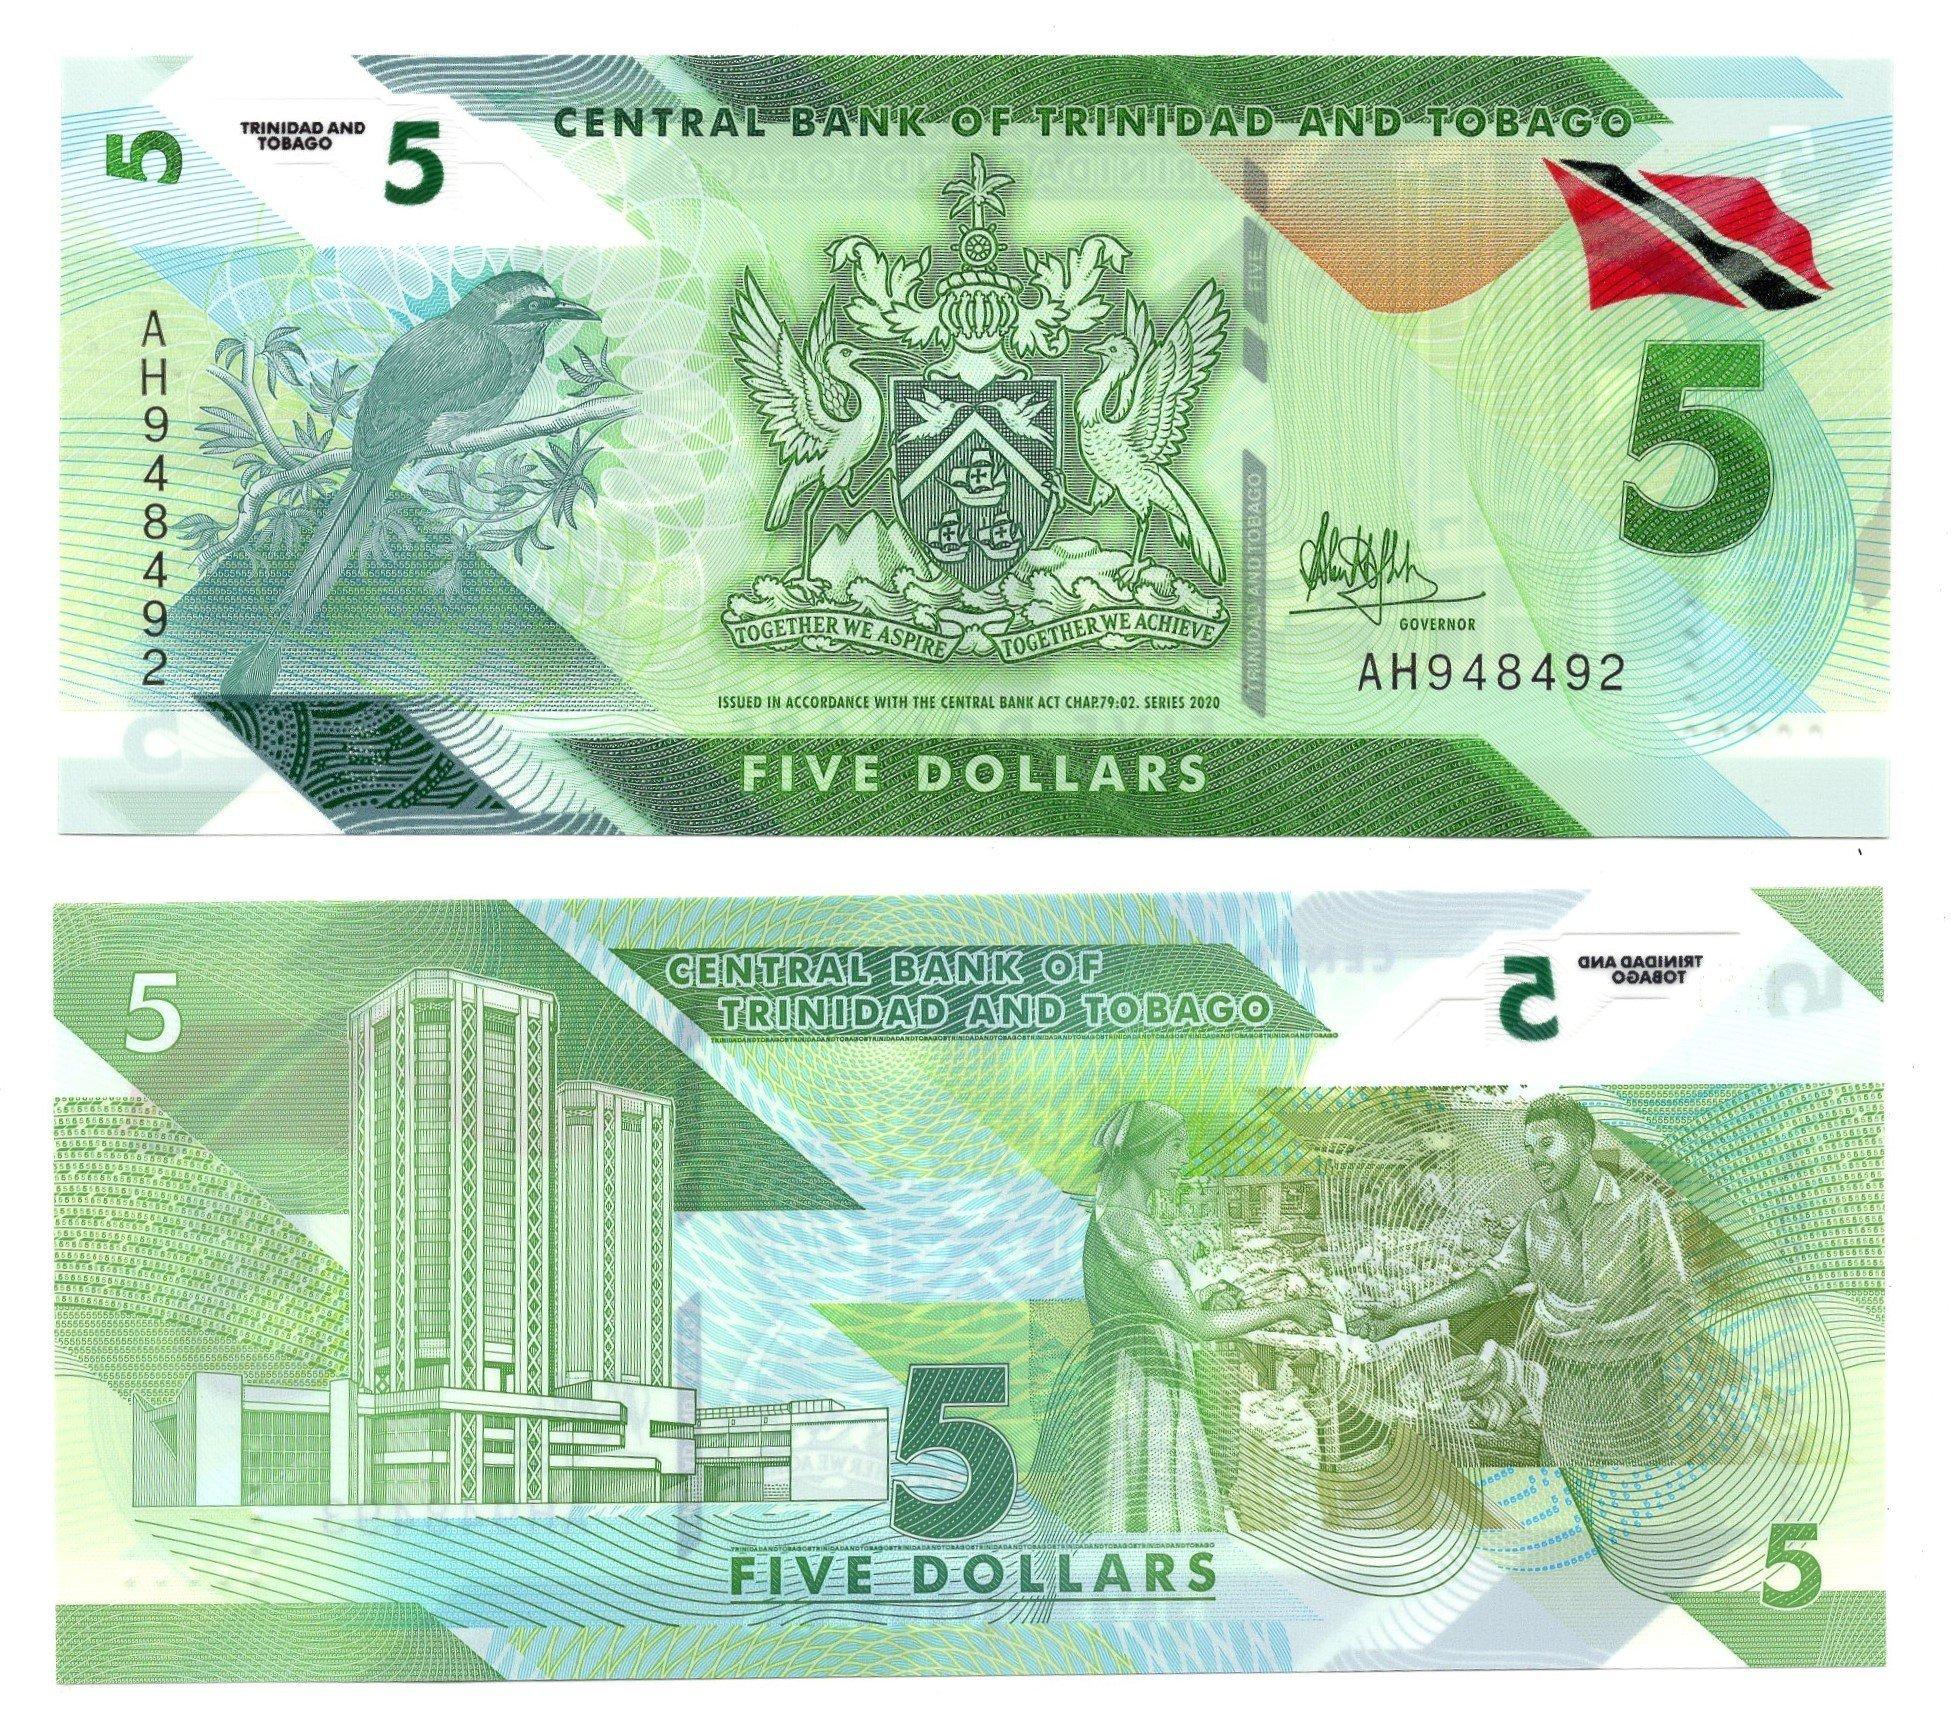 Trinidad and tobago 5 dollars banknote for sale